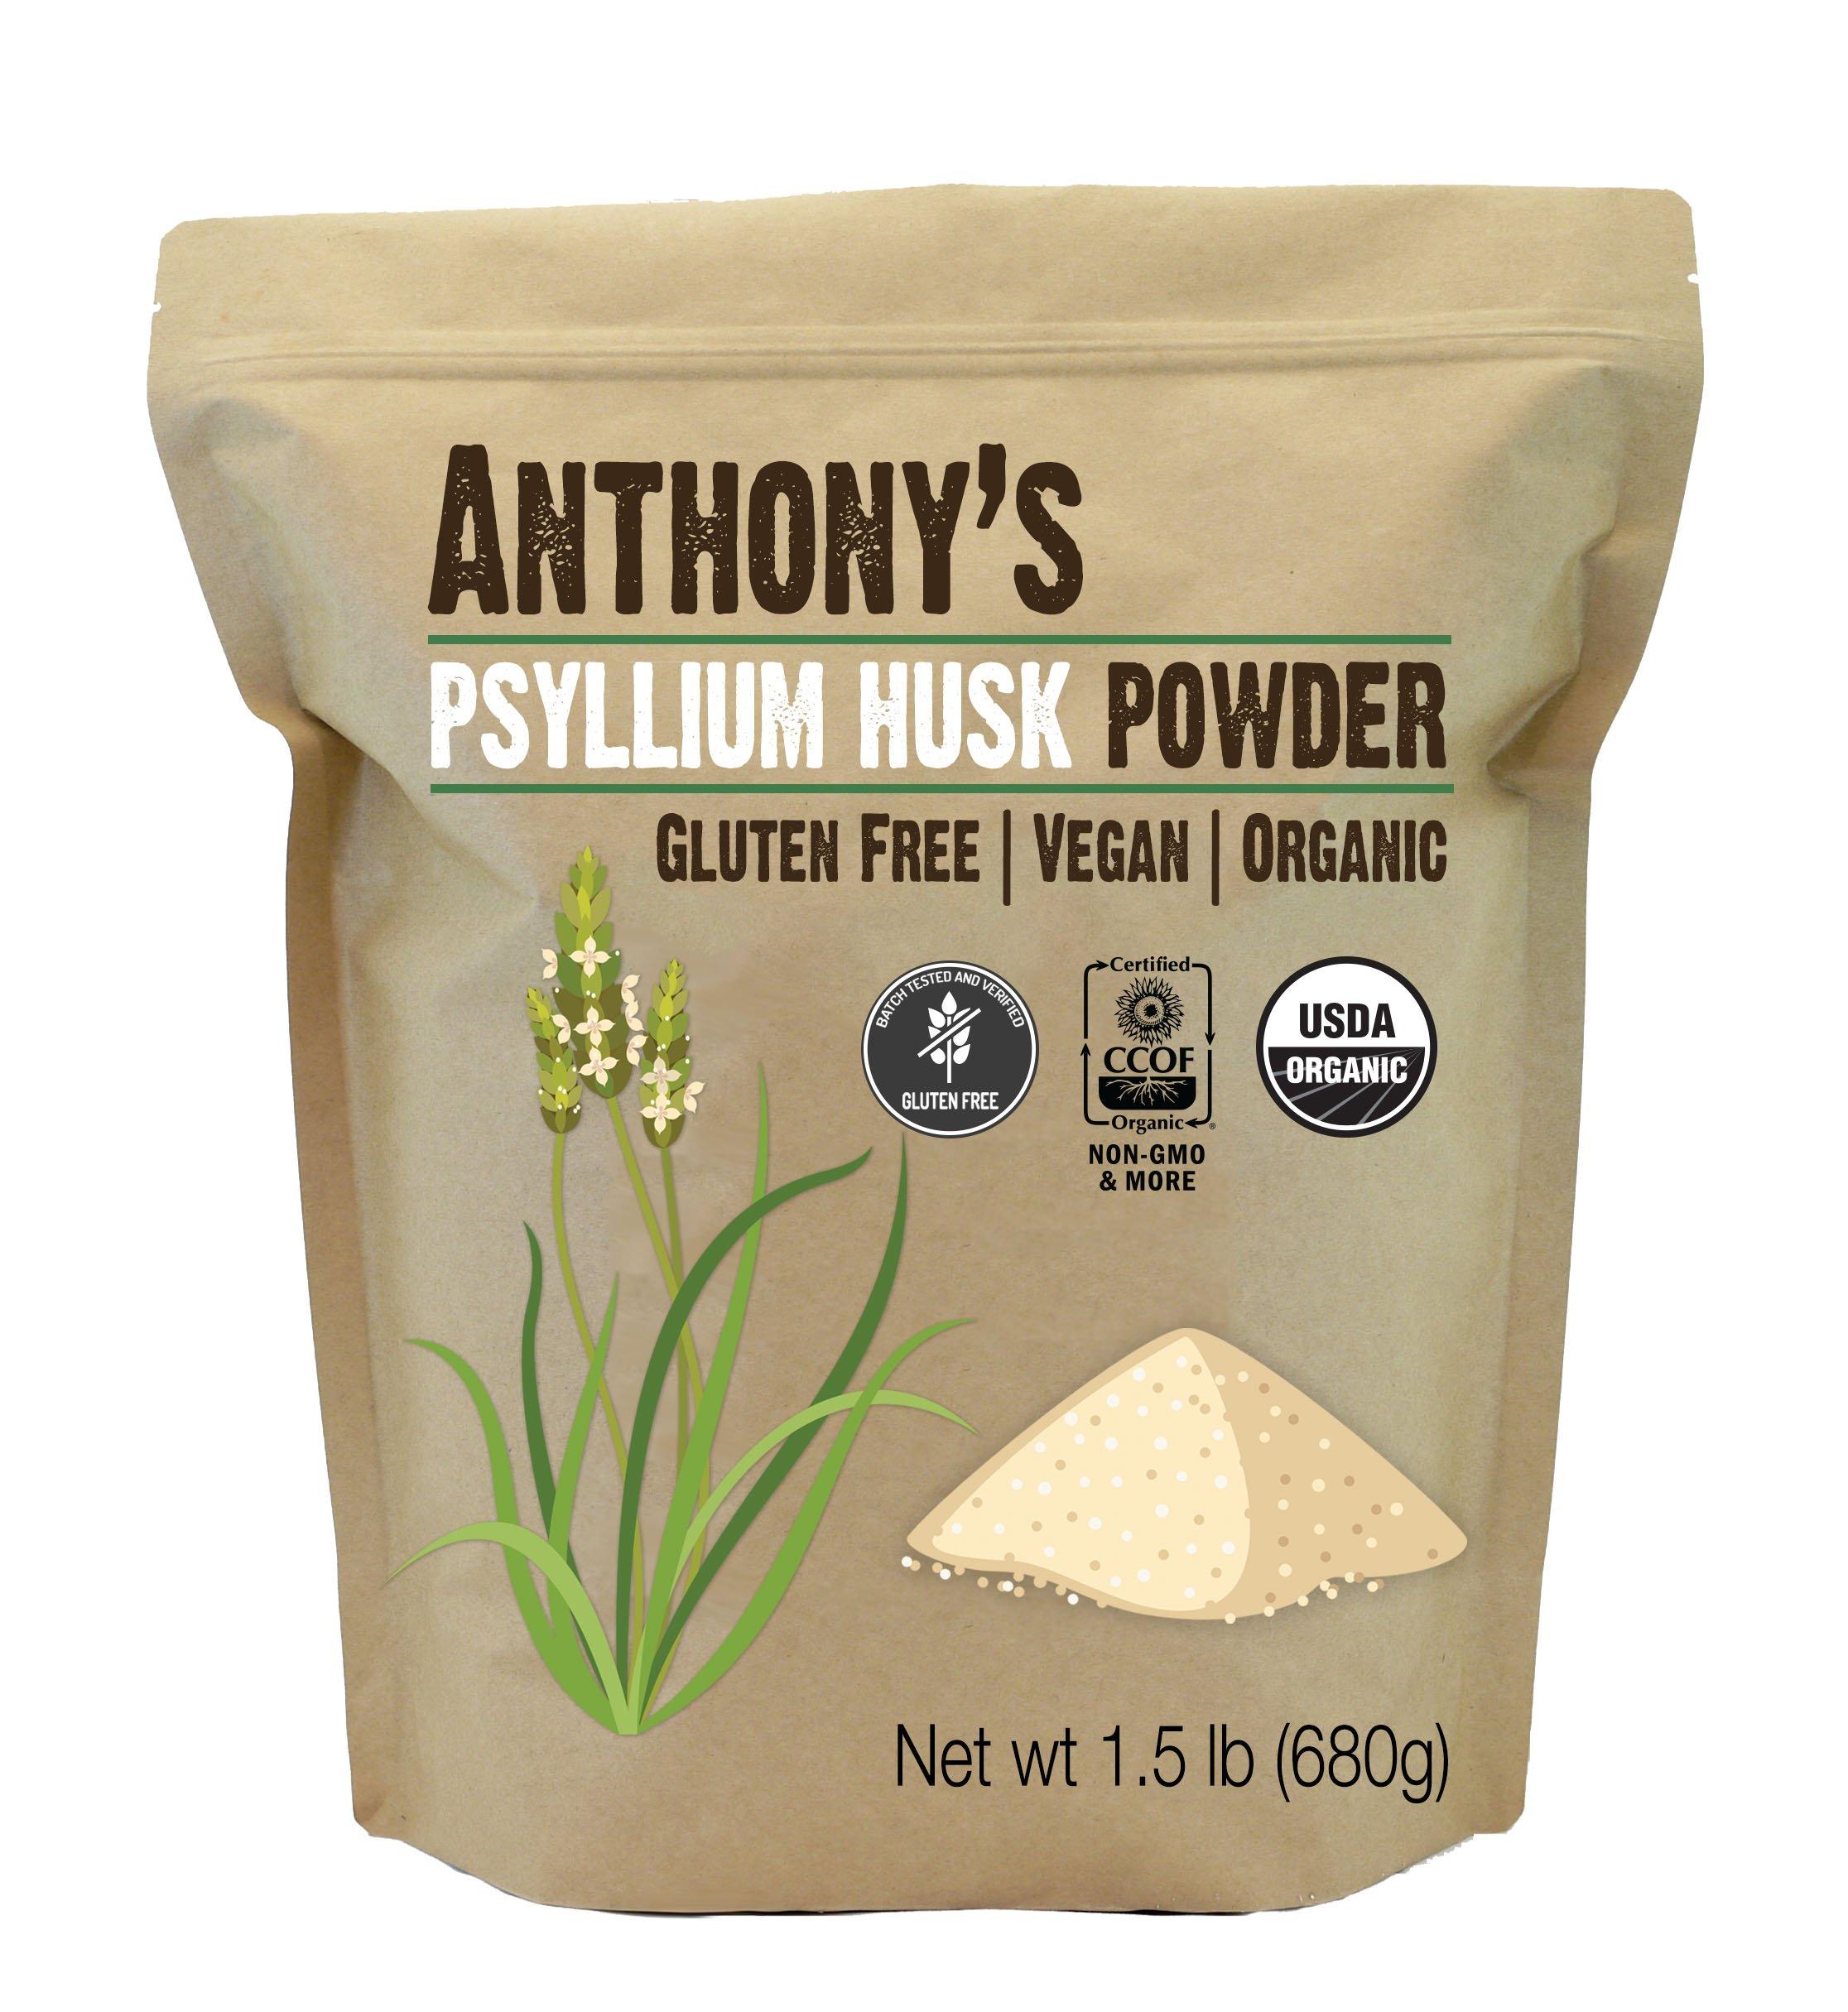 Anthony's Organic Psyllium Husk (1.5lb), Gluten Free, Non-GMO